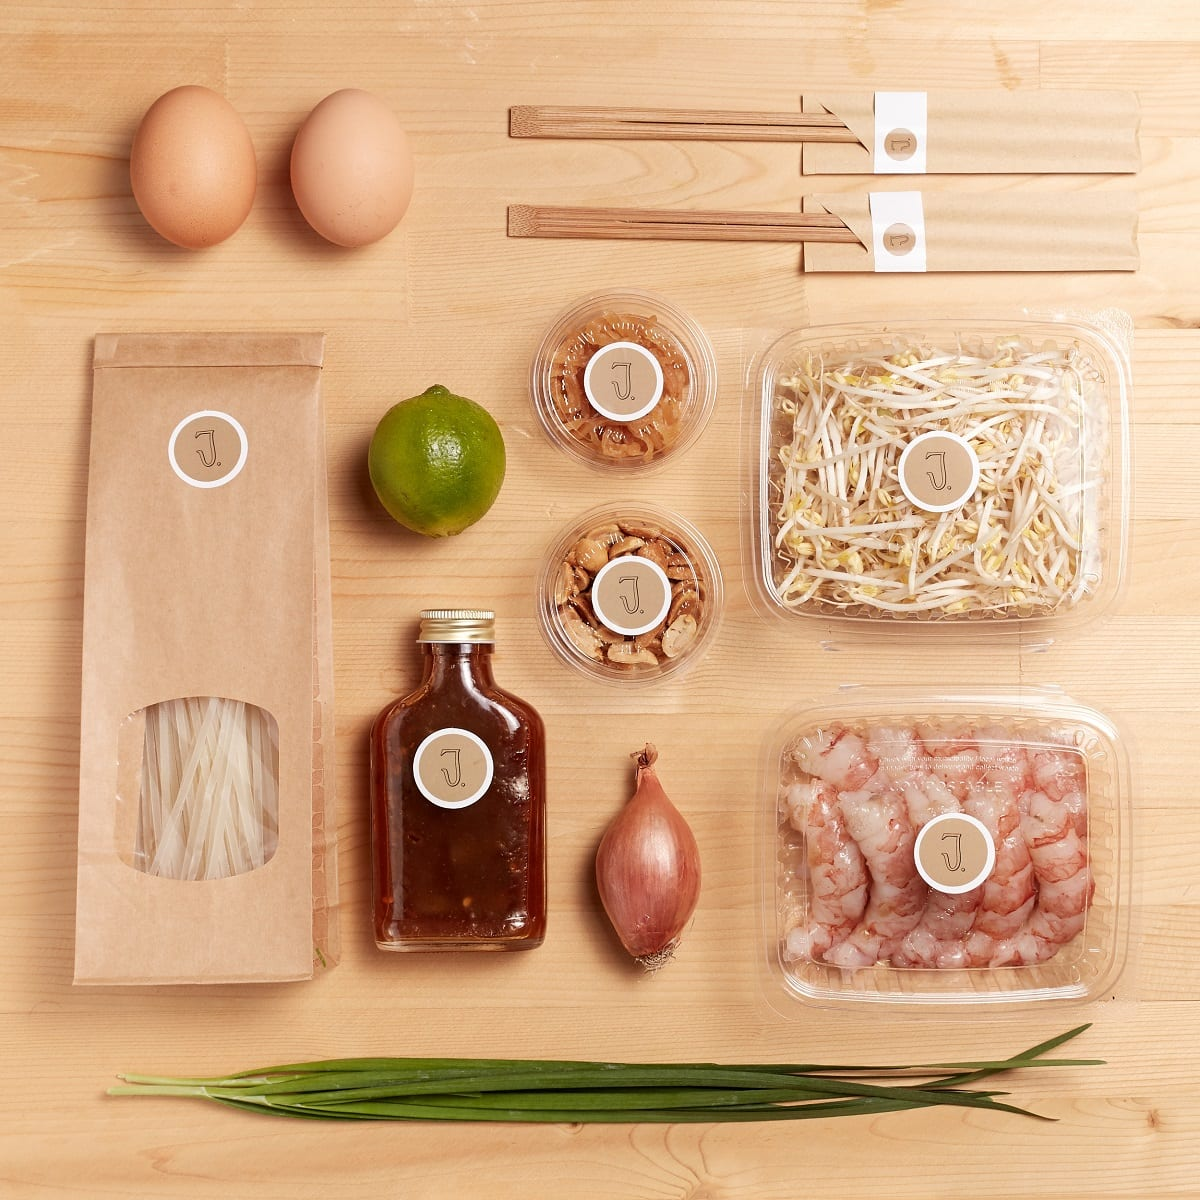 Gli ingredienti della Jaan Box